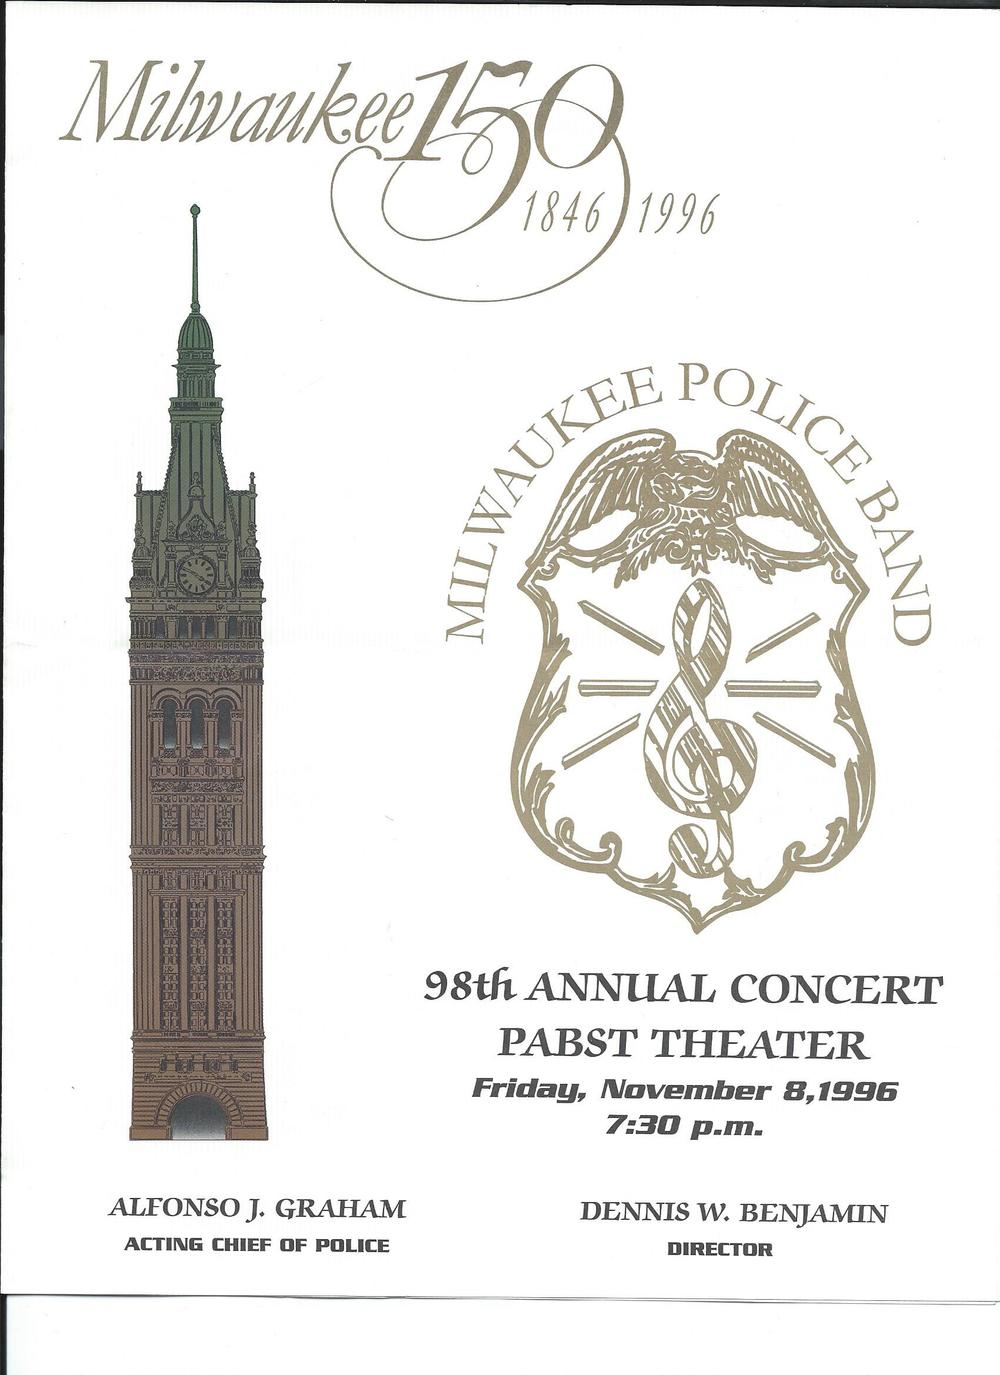 MPB P1 of 1996 Annual Concert.jpg